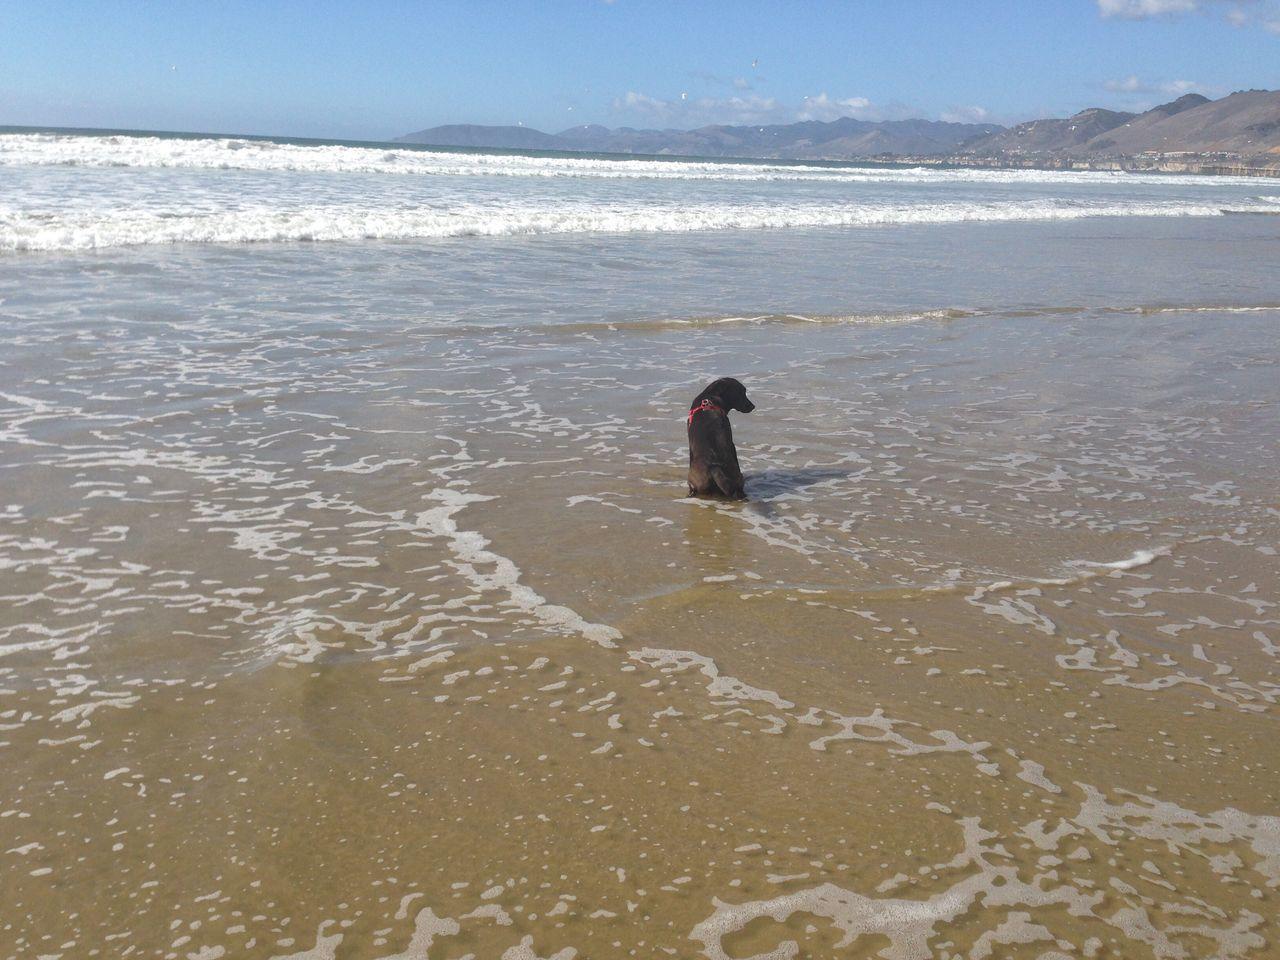 Outdoors Tranquility Labrador My Baby Girl Pismo Beach Ocean View Dog Animal